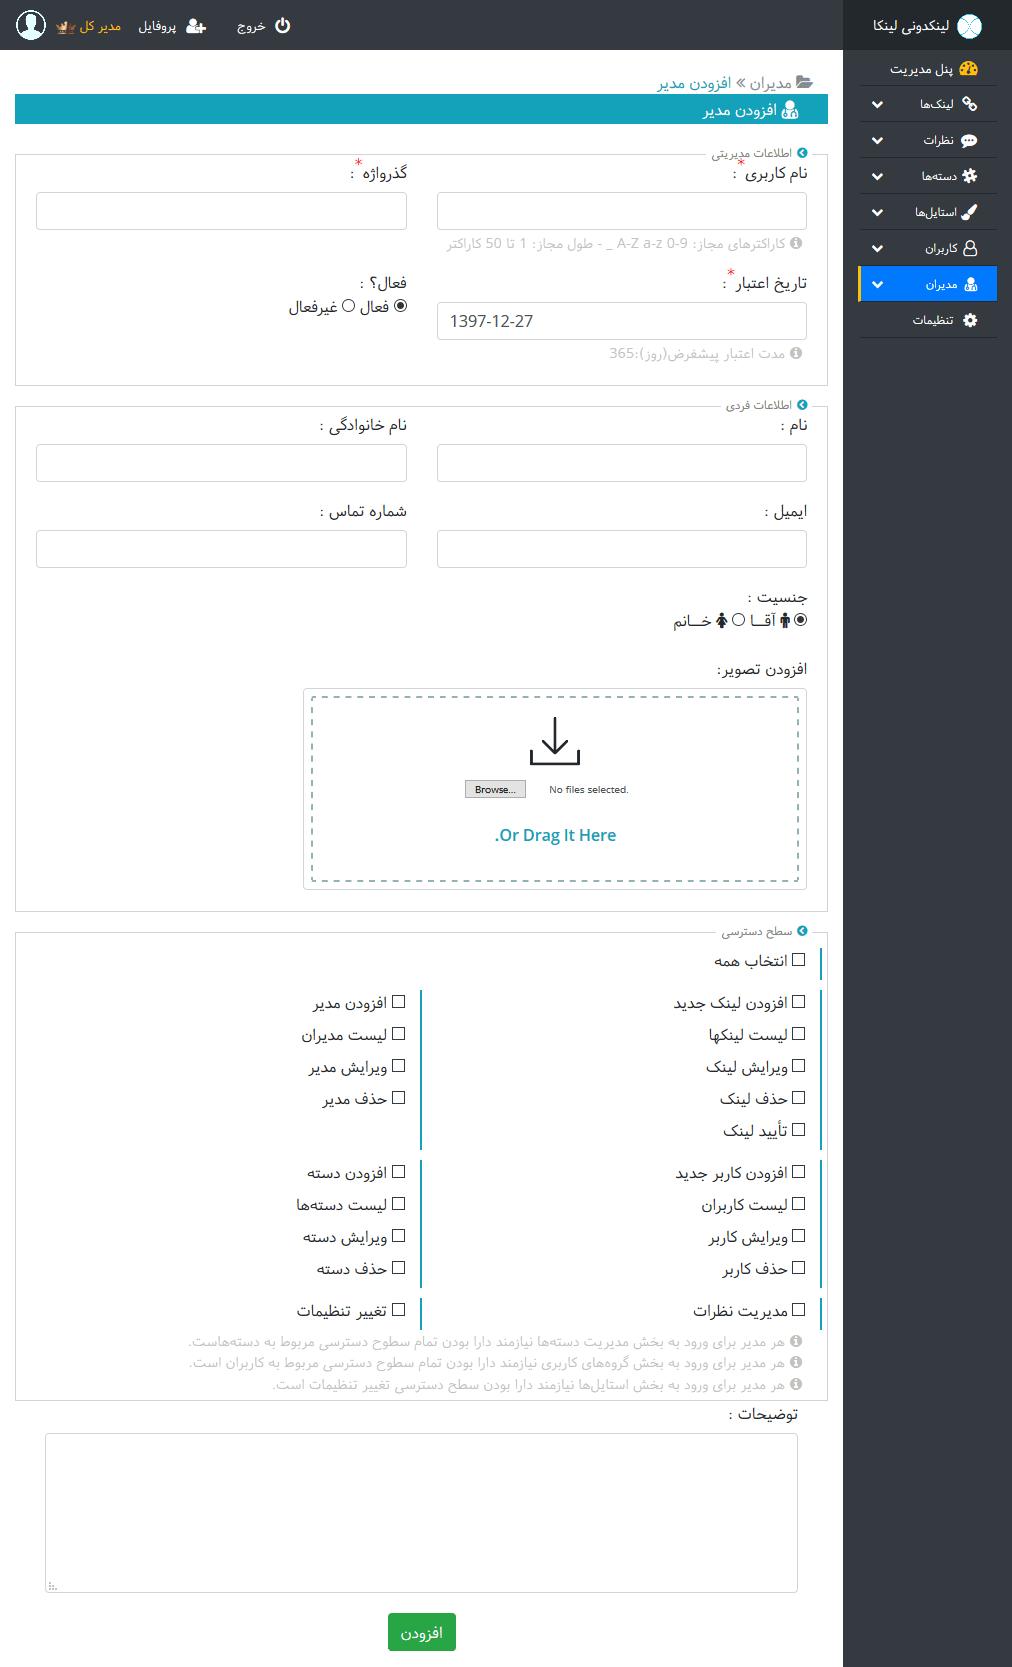 http://img.aftab.cc/products/linka/linka3_screenshot6.png